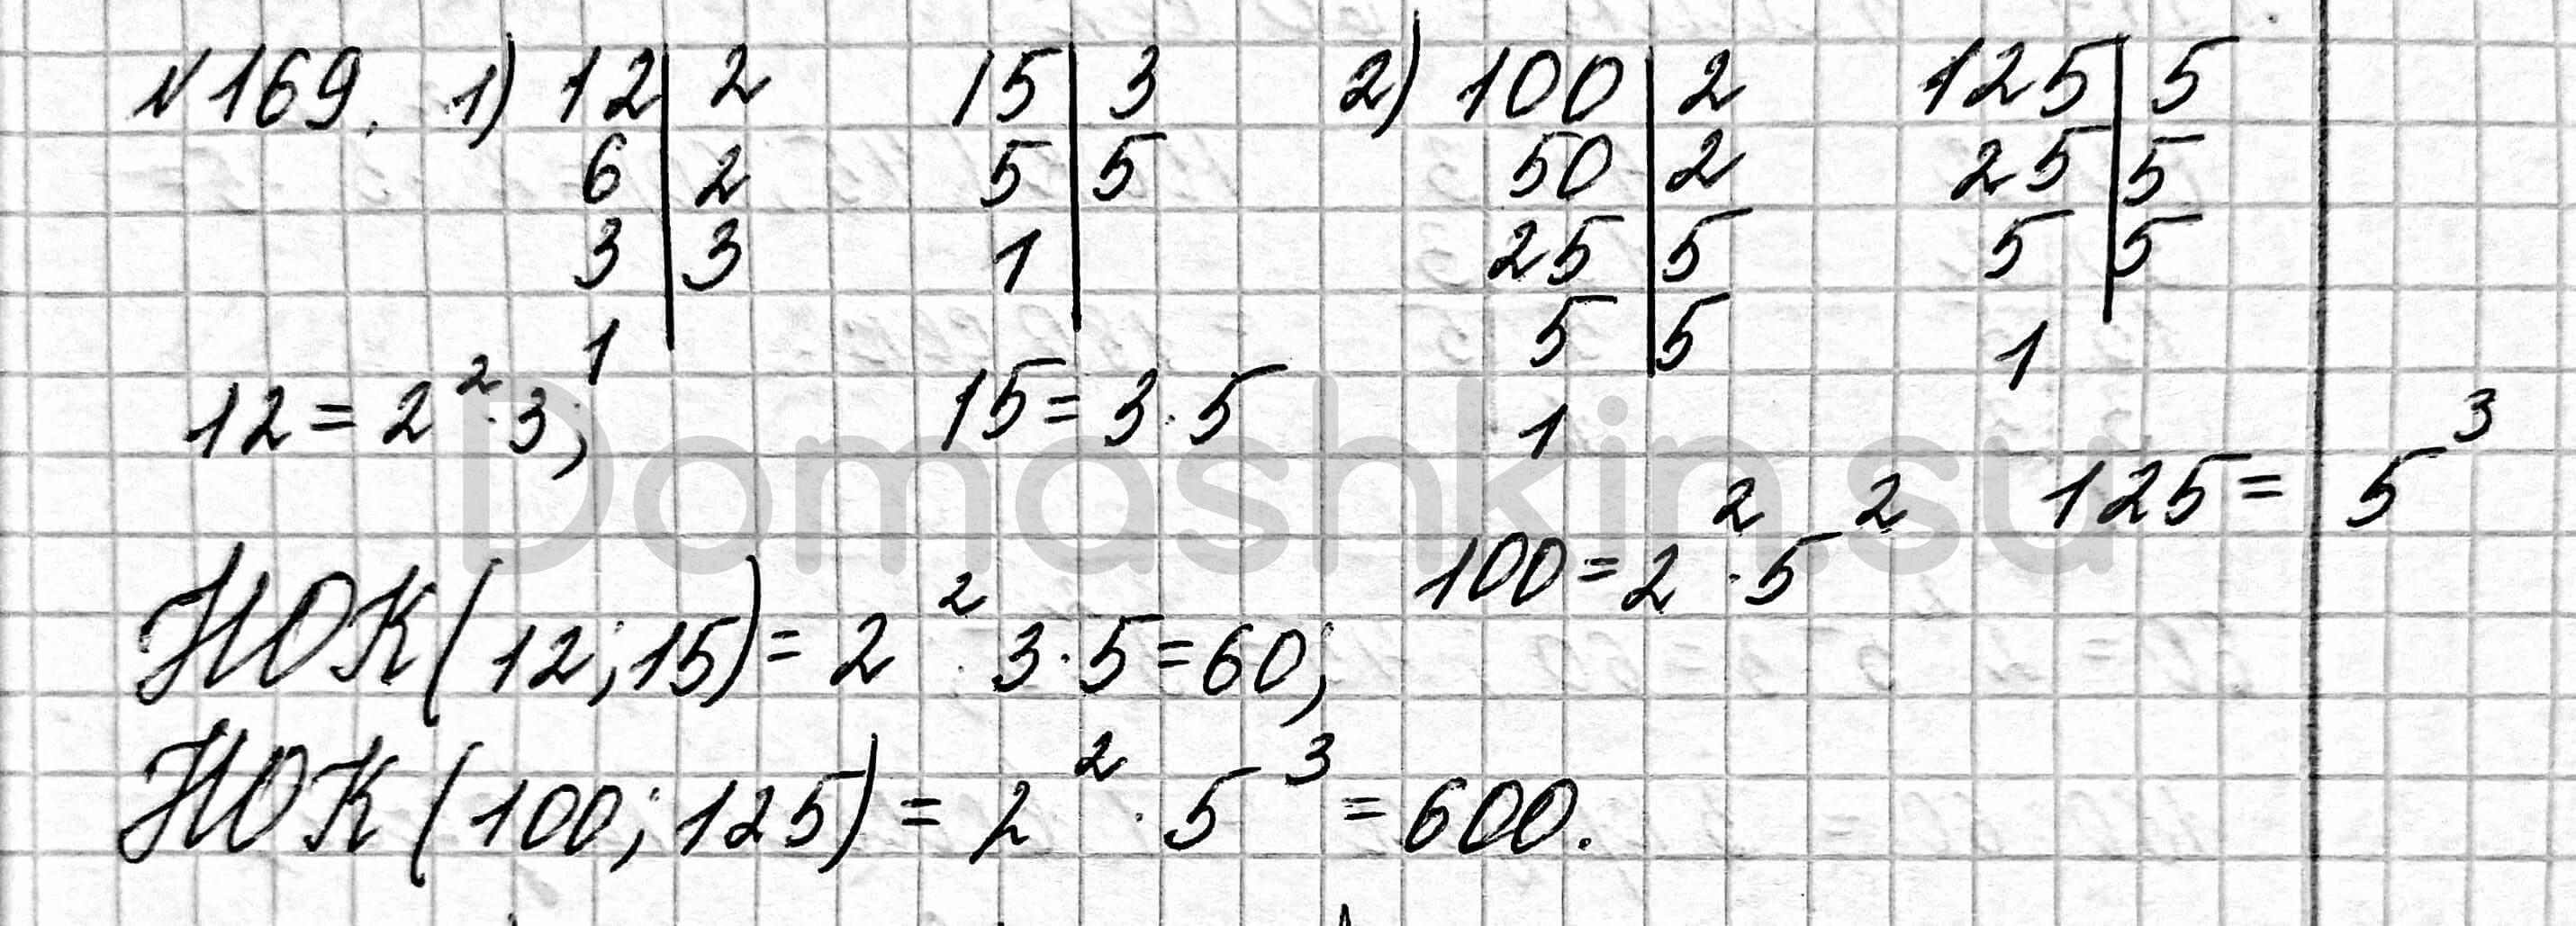 Математика 6 класс учебник Мерзляк номер 169 решение